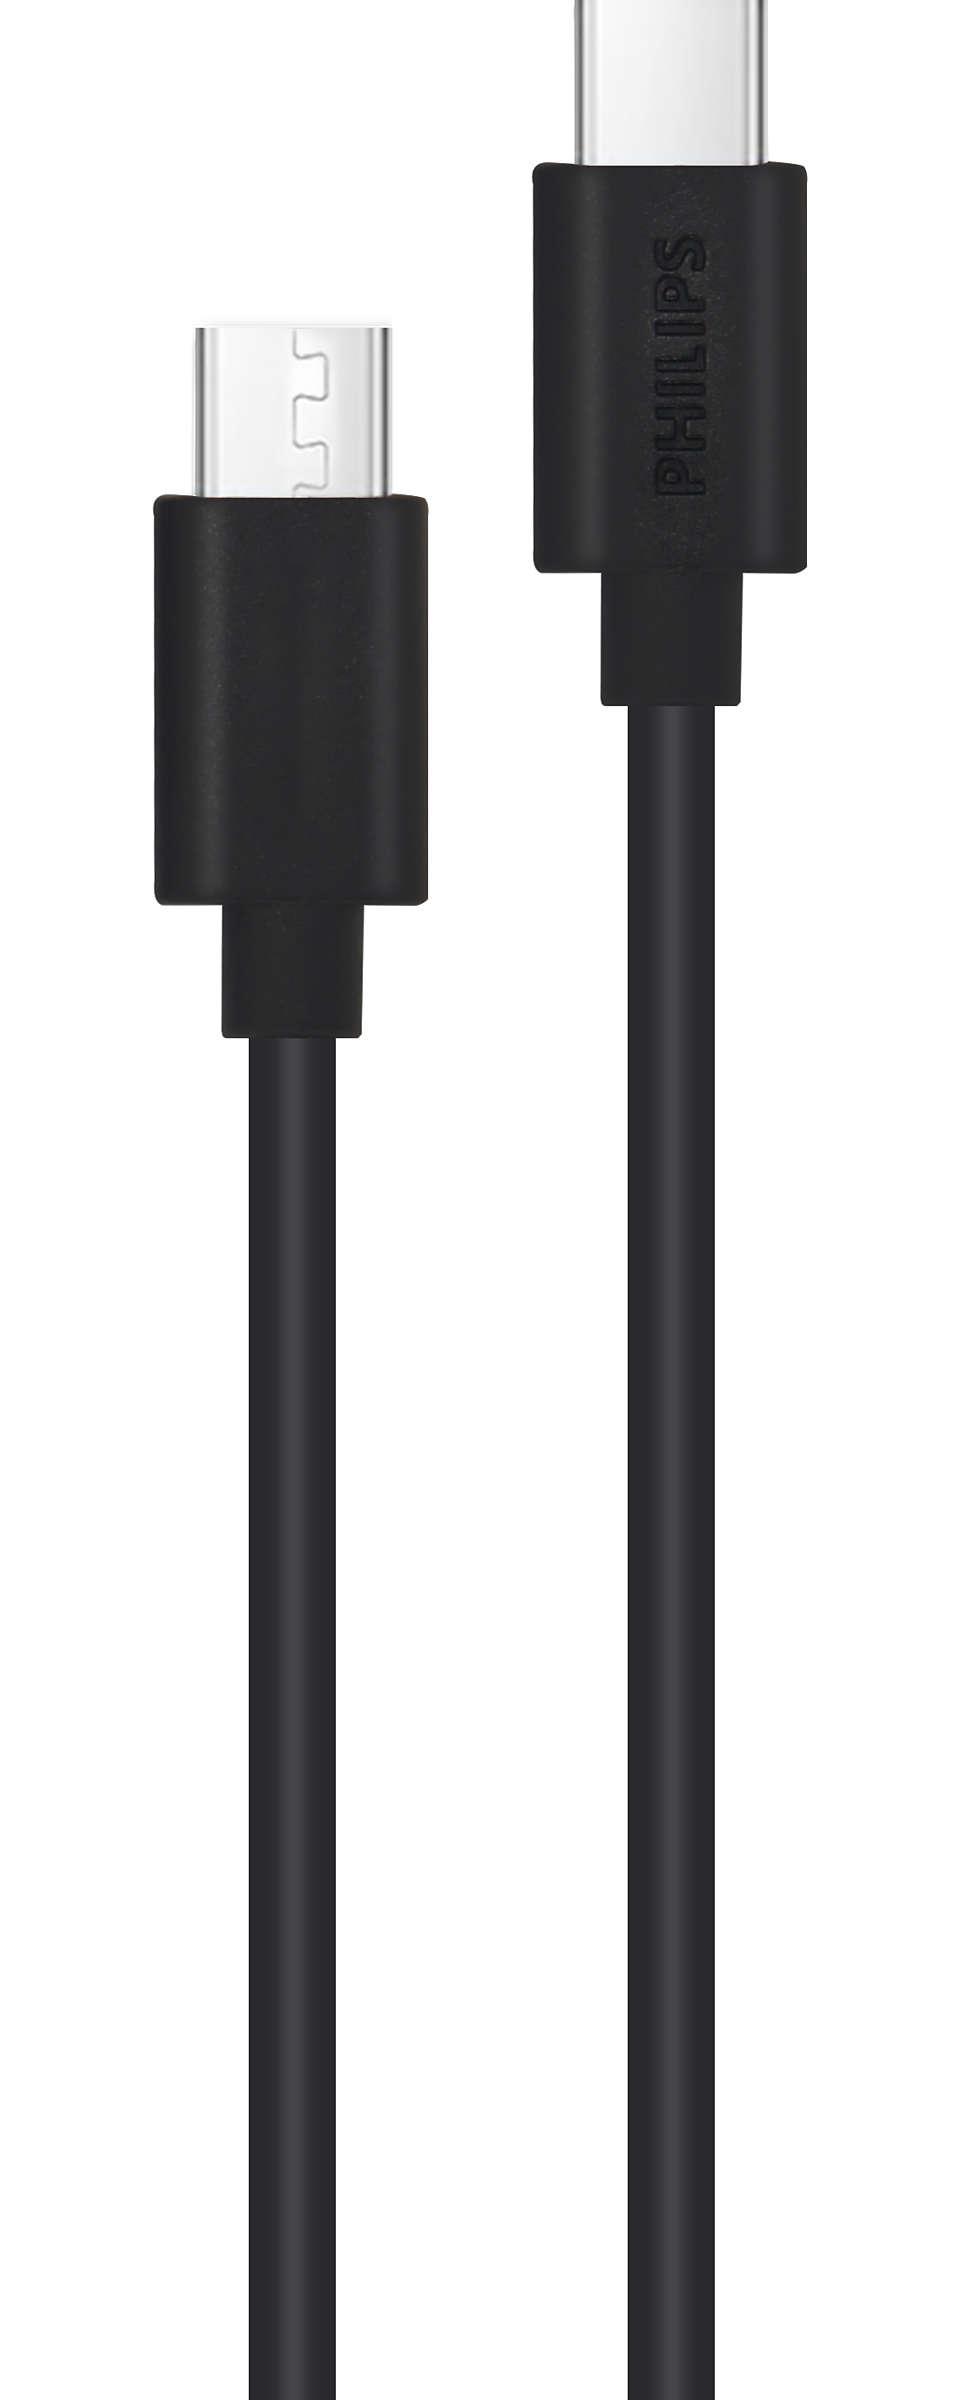 1.2 米 USB-C 至 USB-C 线缆